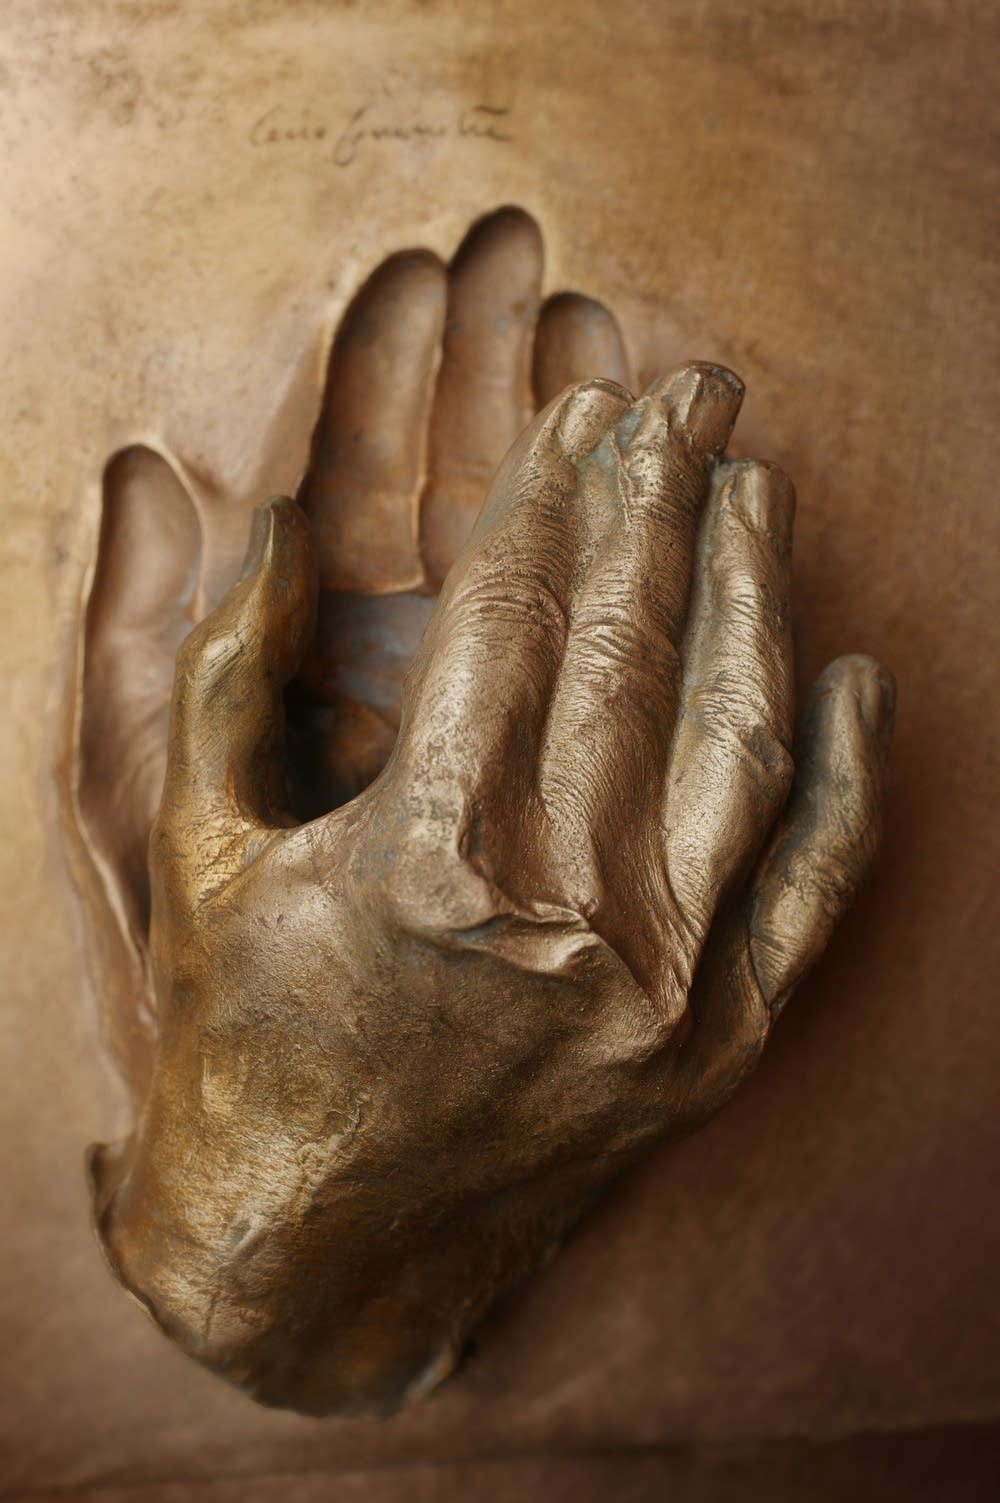 Hand of Pope John Paul II